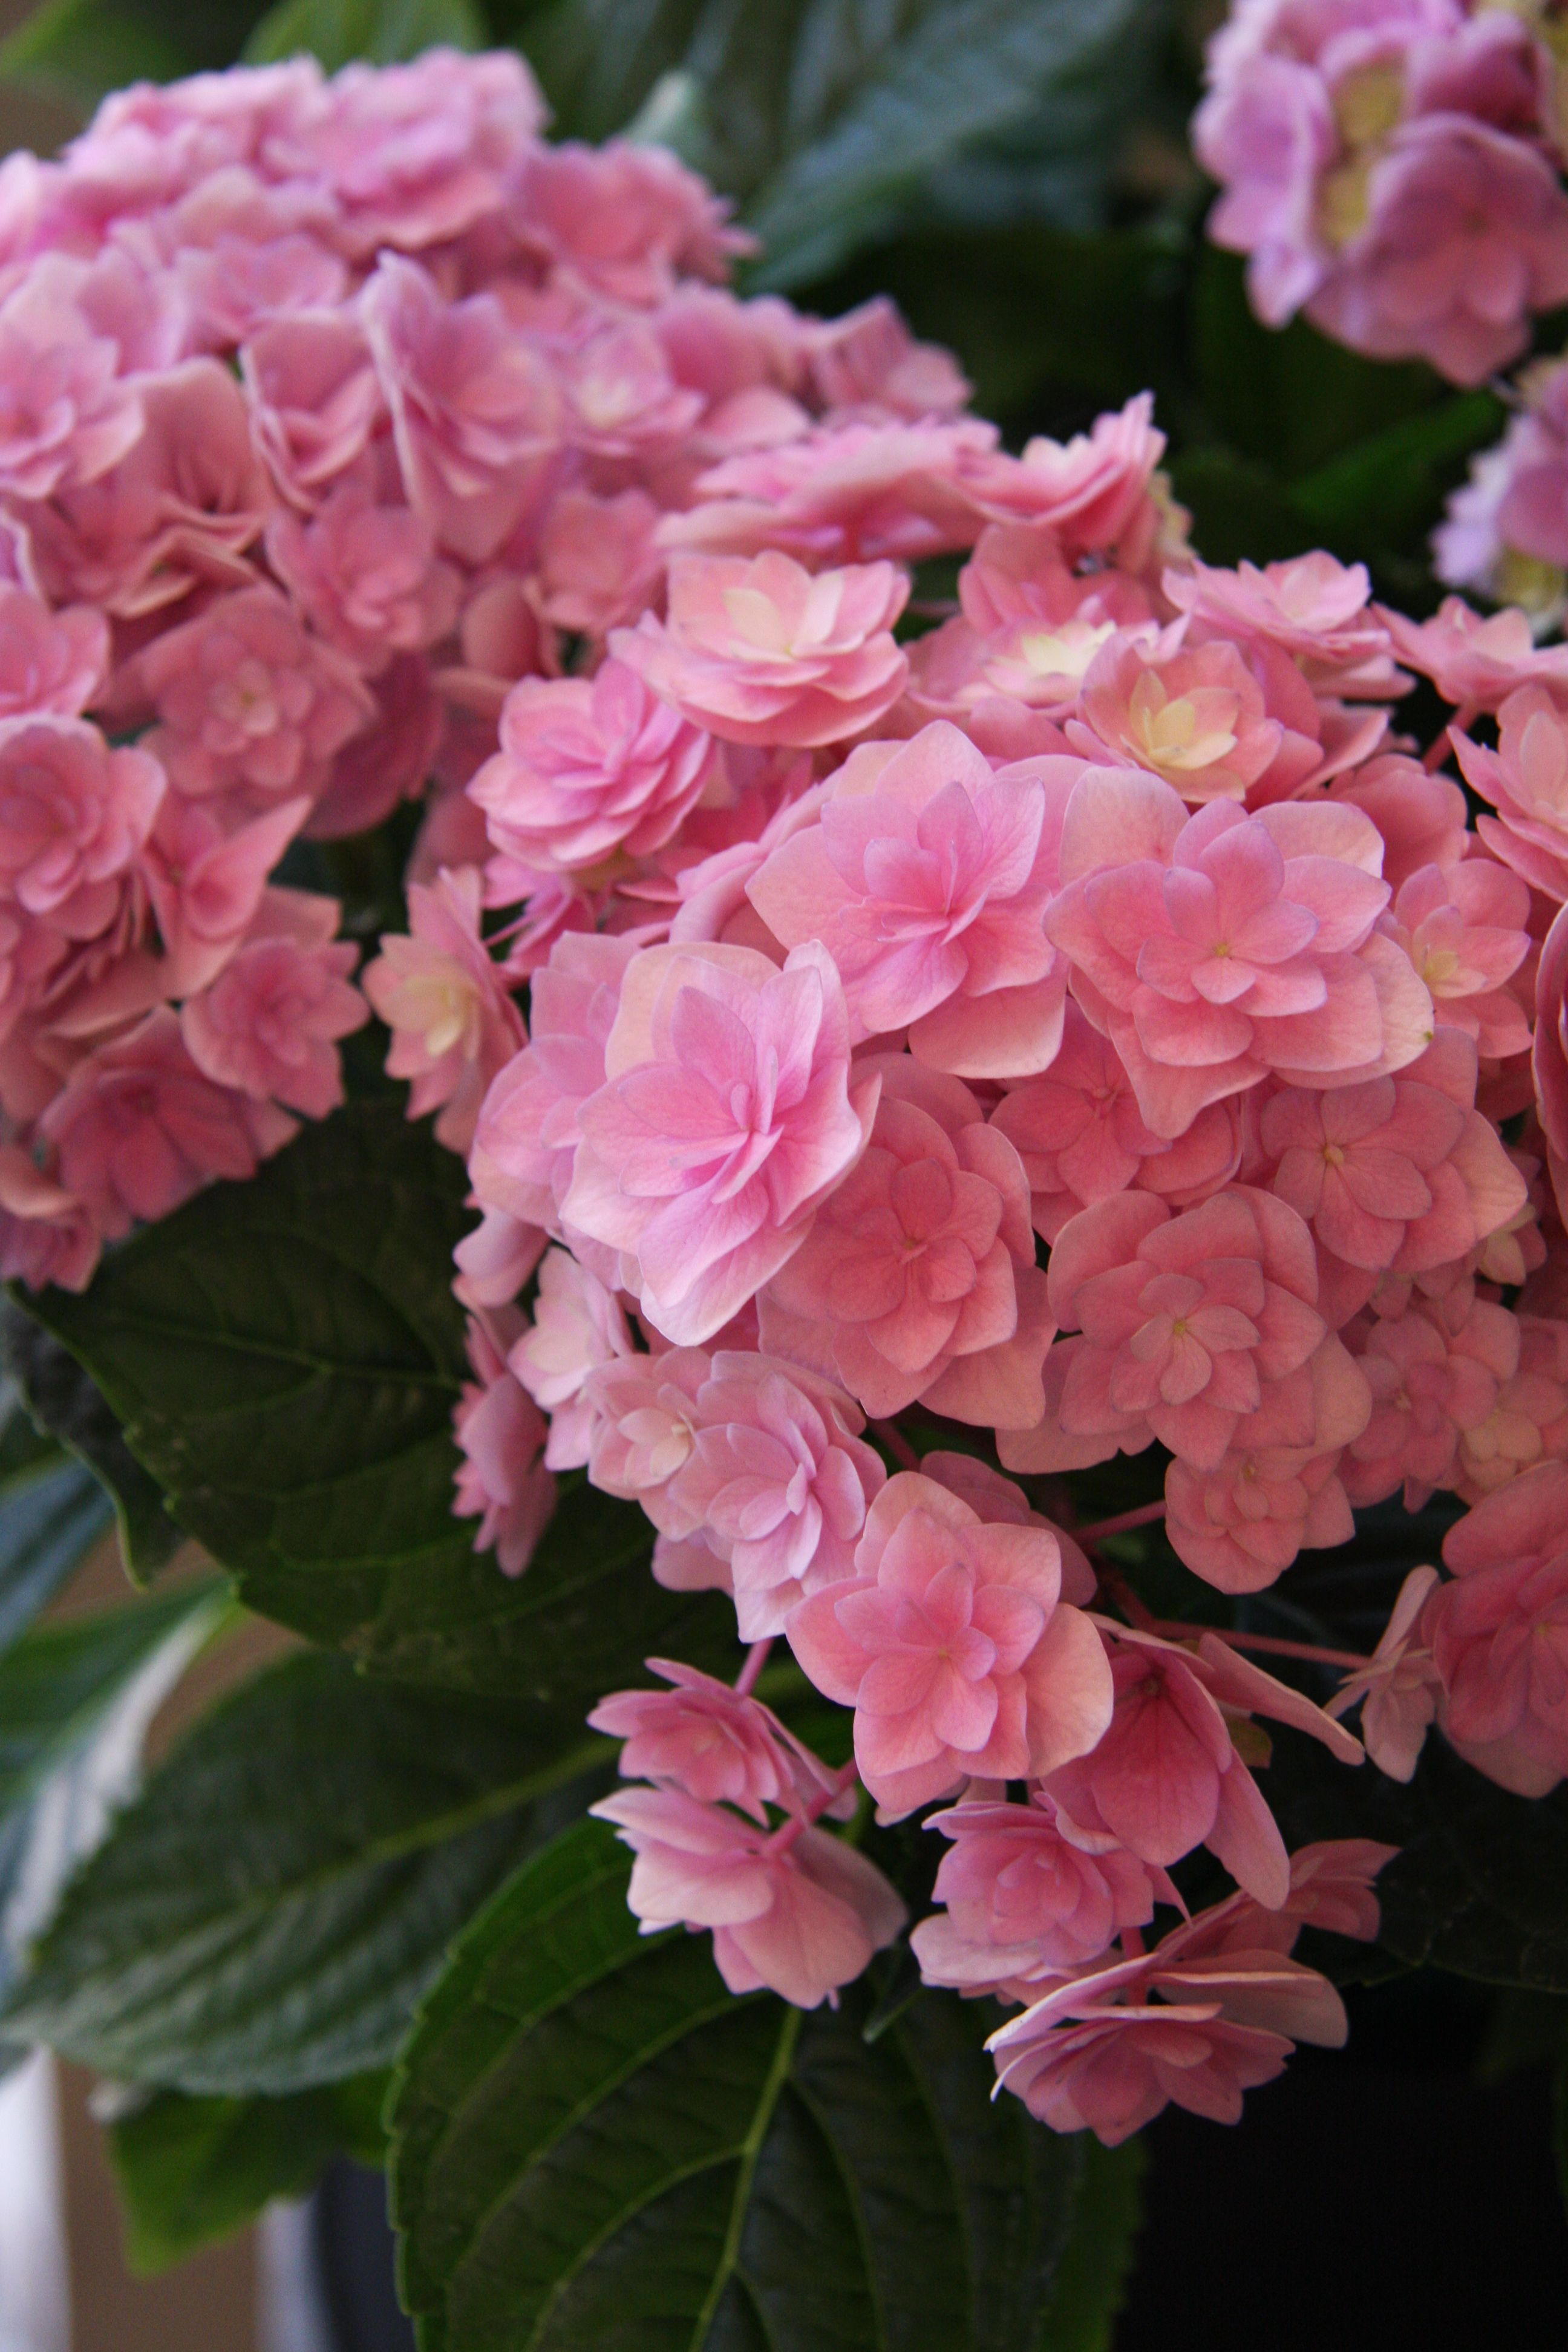 Hydrangea You Me Together Pink Peonies And Hydrangeas Pink Hydrangea Pink Garden